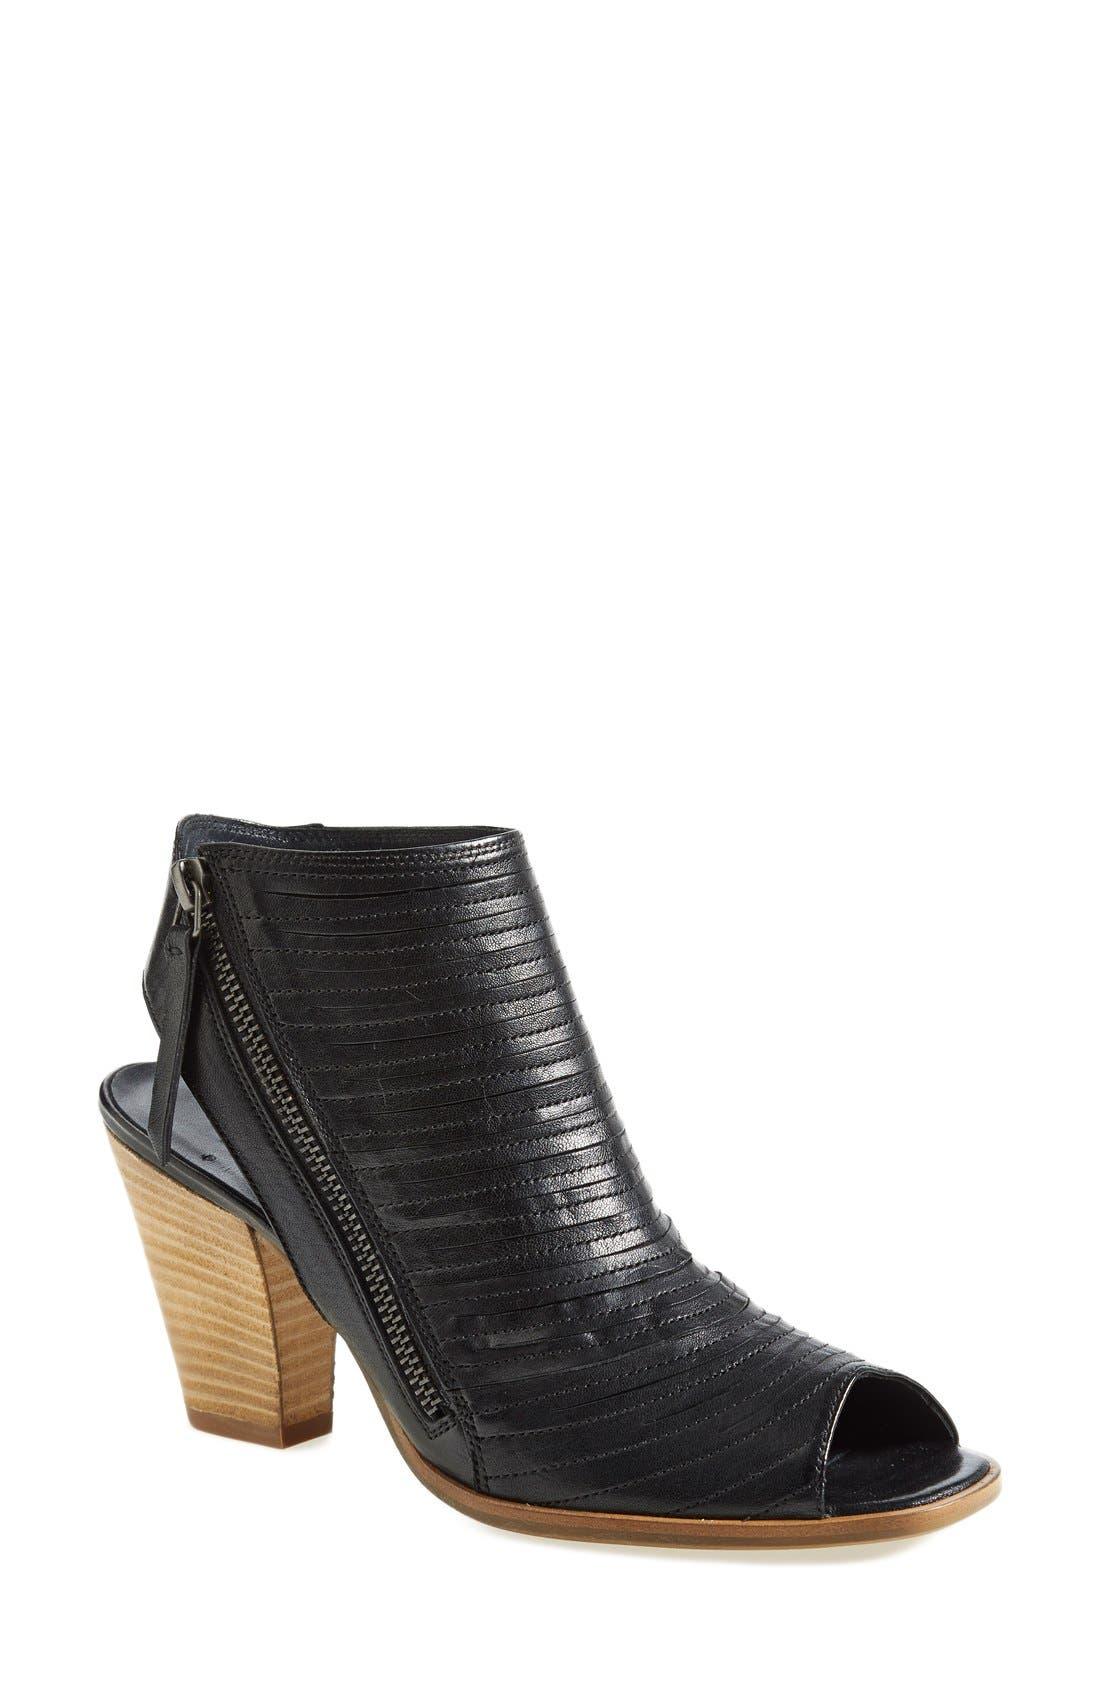 'Cayanne' Leather Peep Toe Sandal,                             Main thumbnail 5, color,